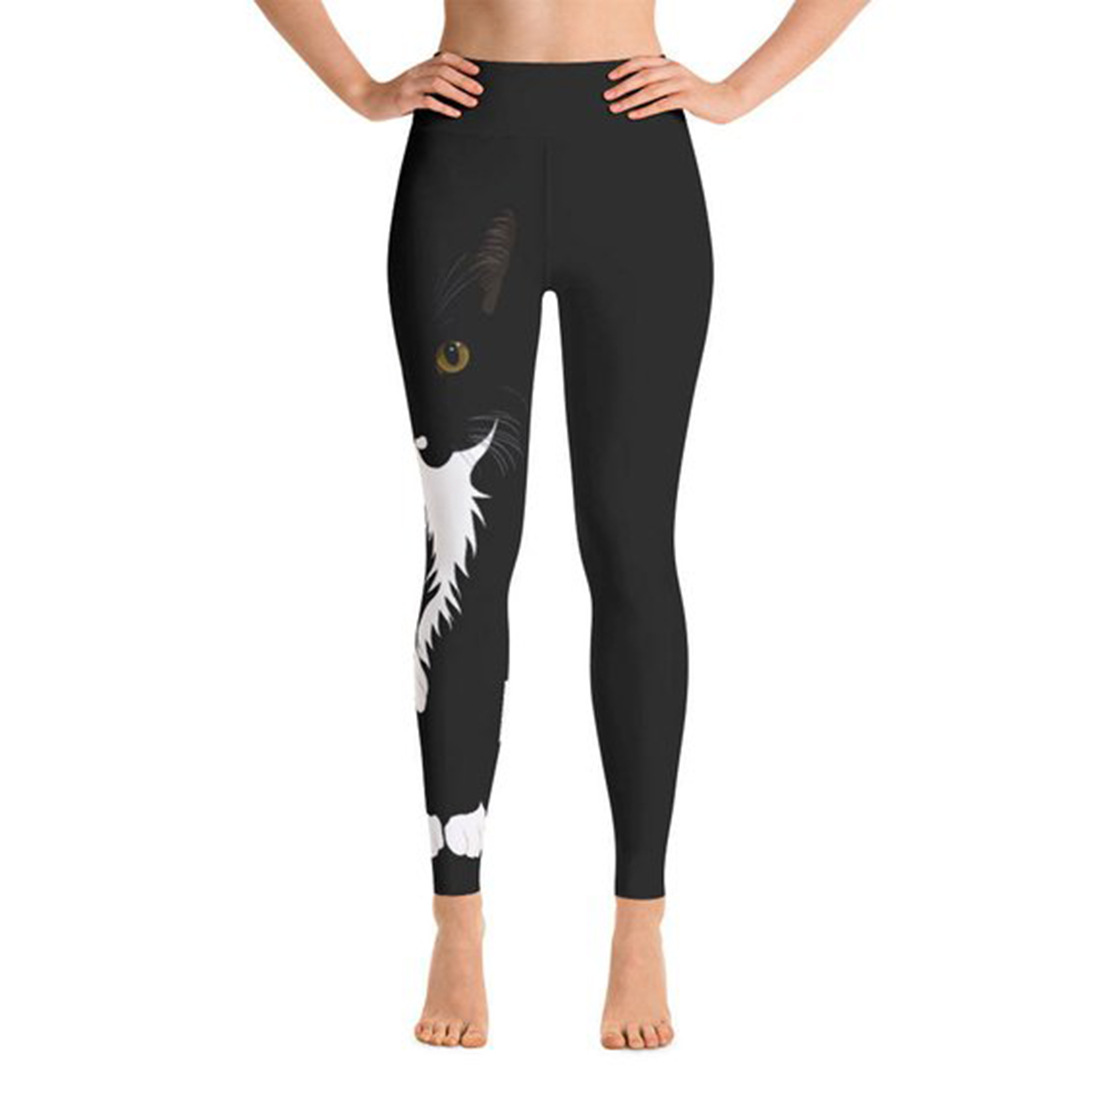 2019 Summer New Products Cross Border Black Cat Capri Pants Women's Fashion & Sports   Leggings   JK1-038